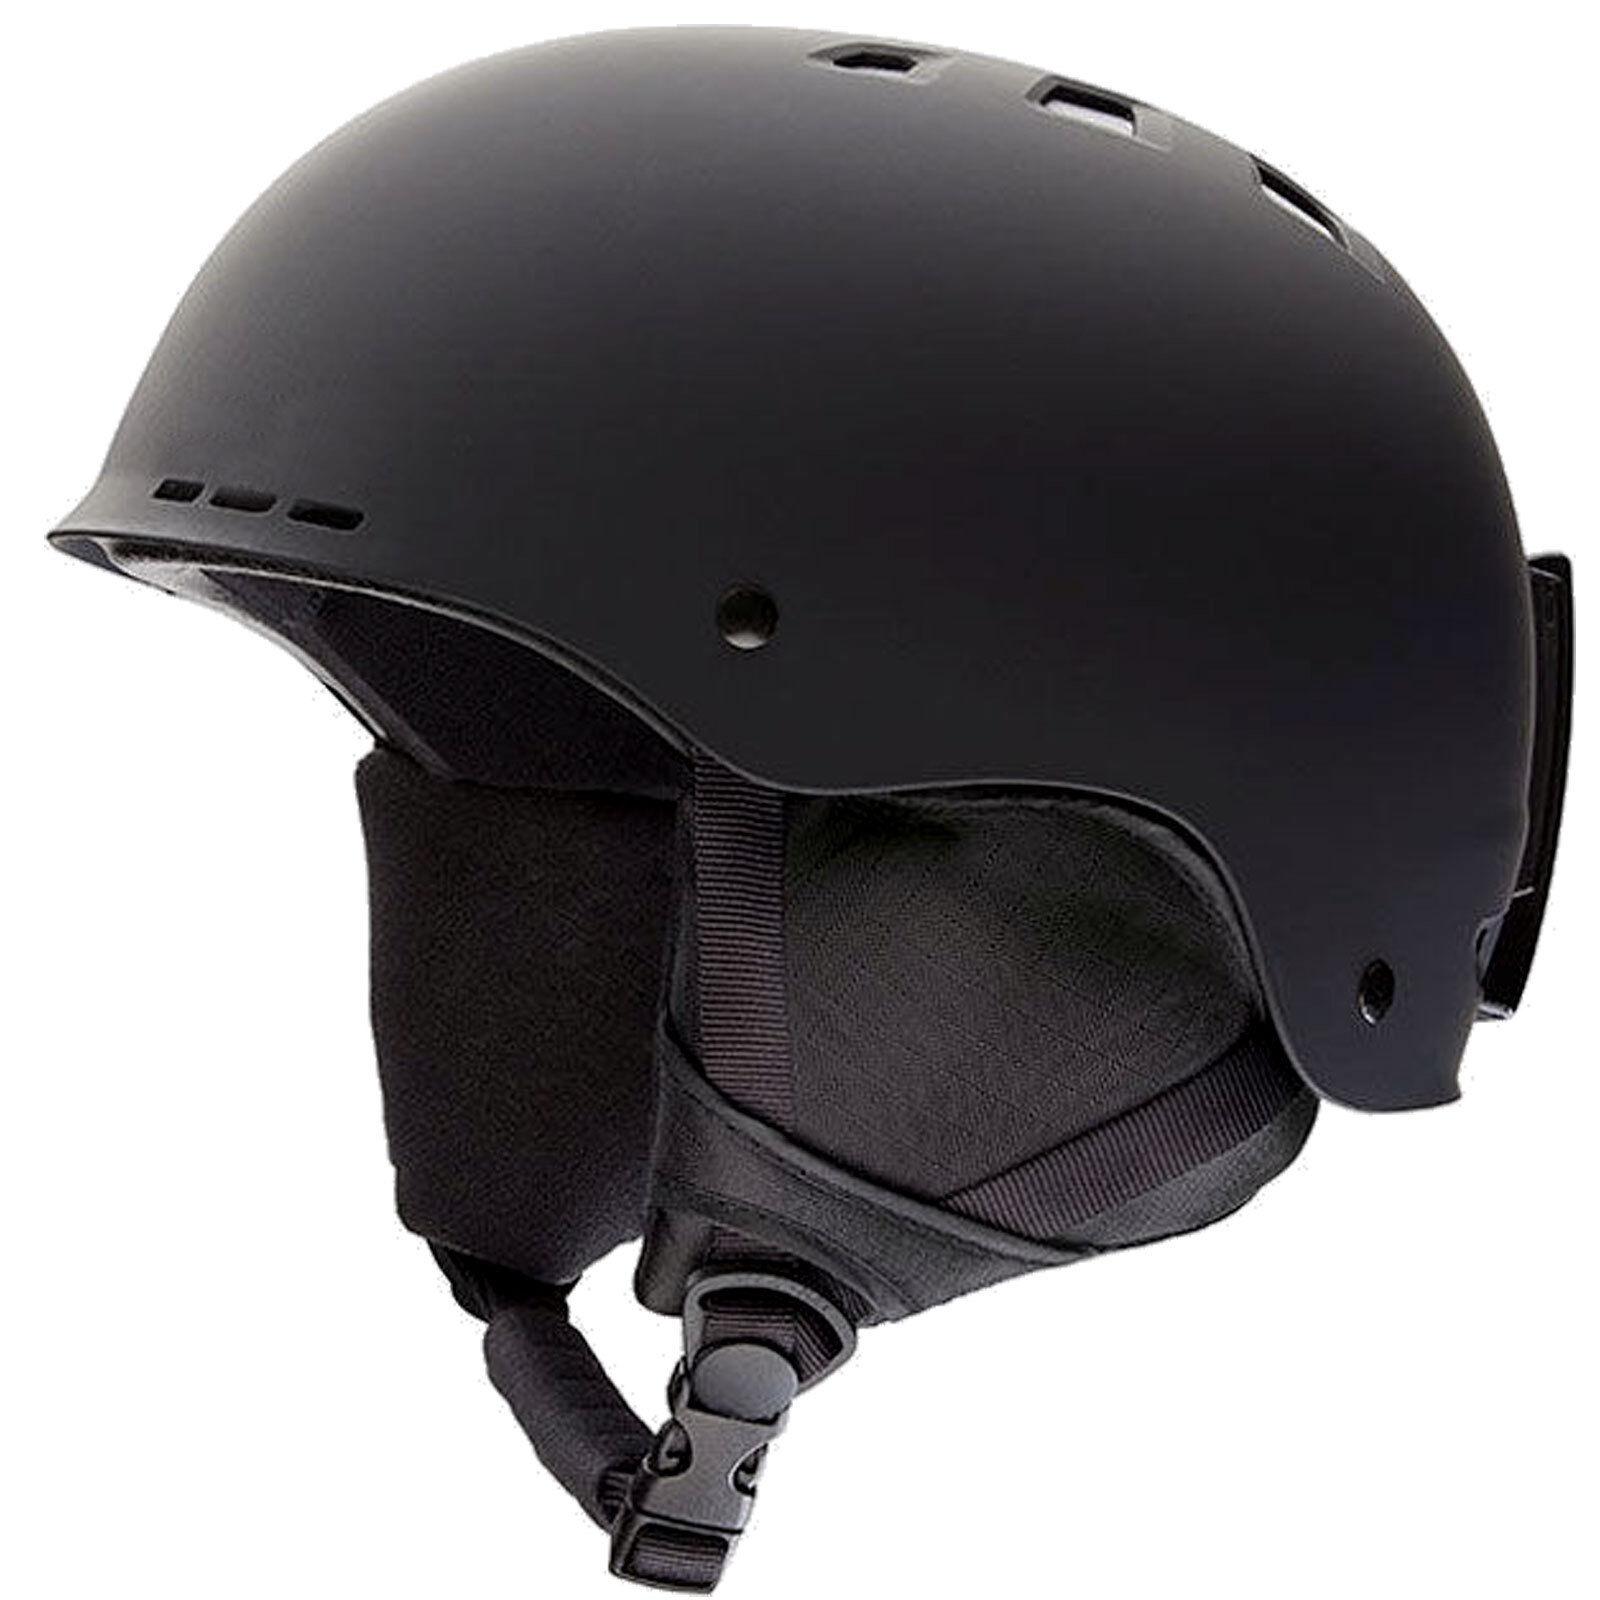 Smith Holt Skihelm Snowboardhelm Helm Helm Helm Helmet Wintersport Protektion NEU f40f6c